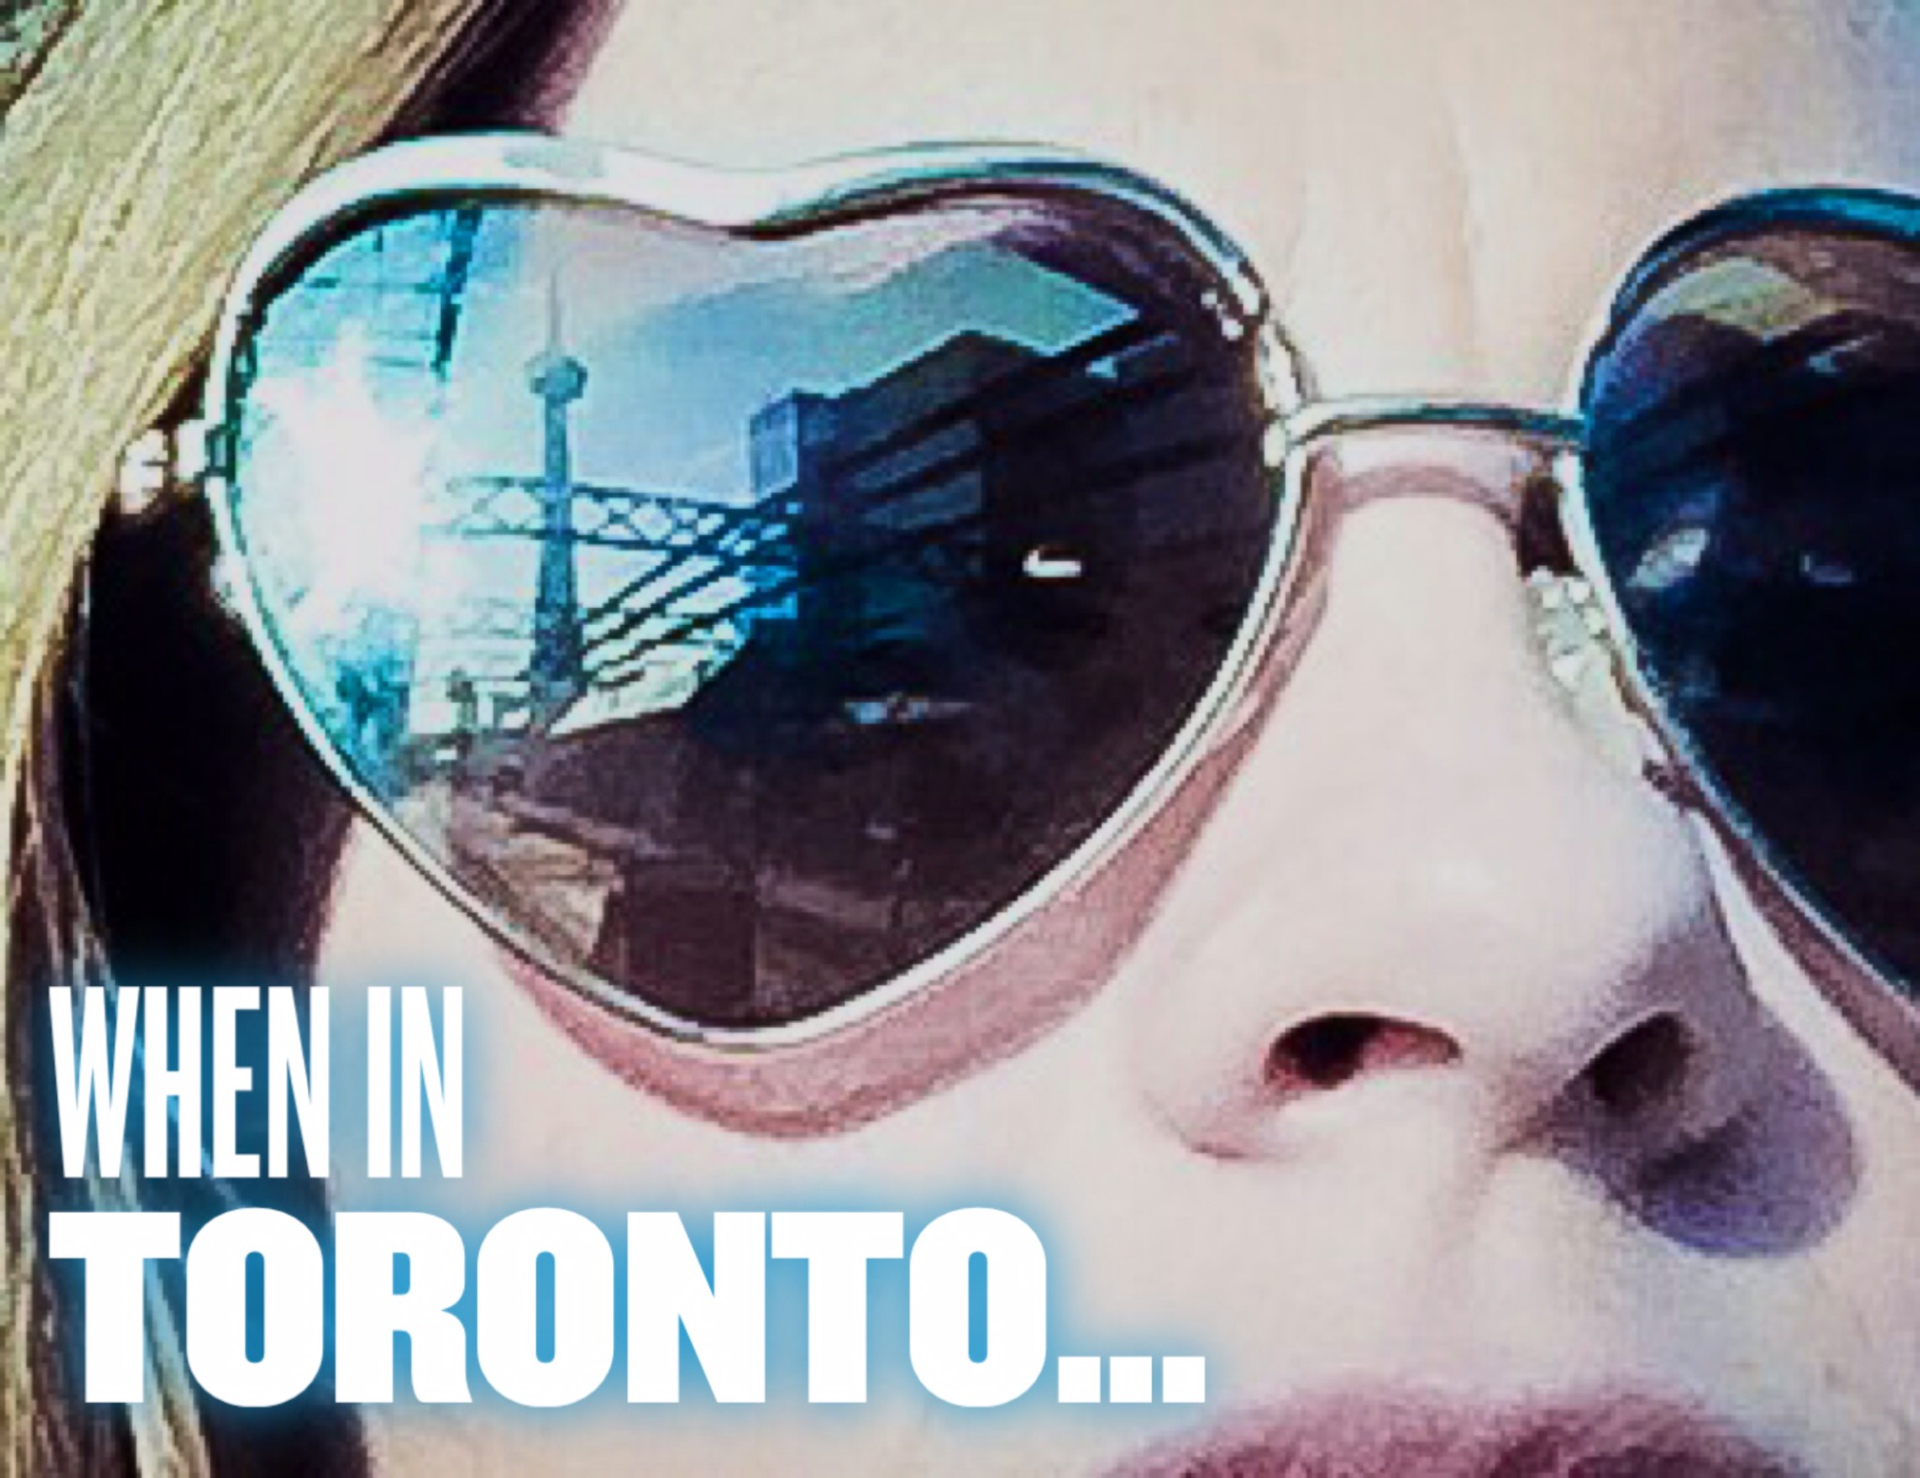 Toronto, eh?